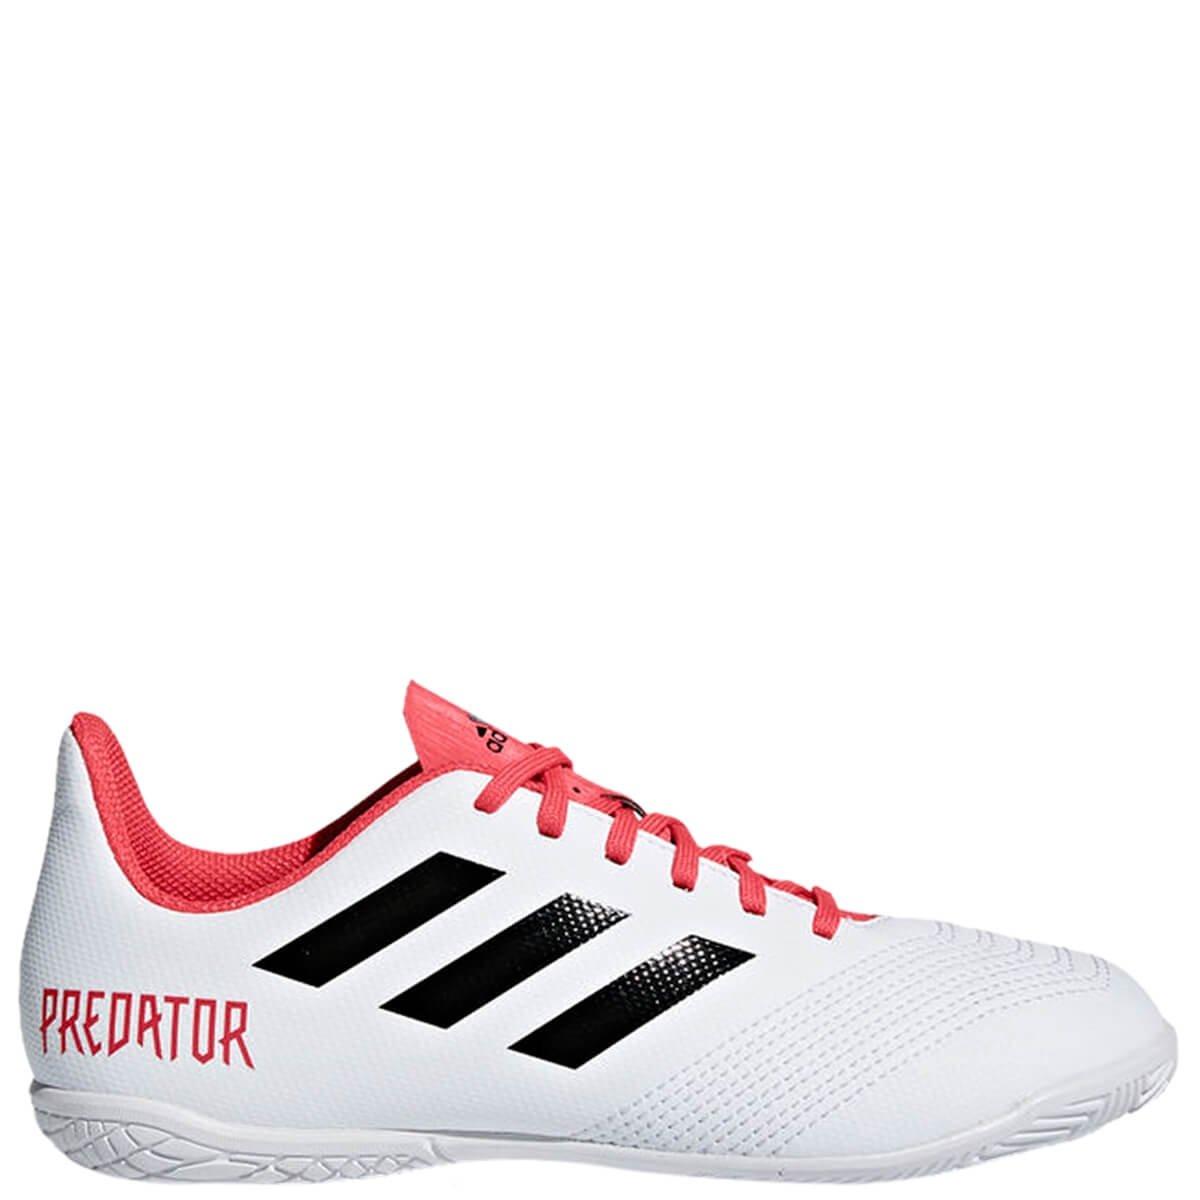 f0b4b4fd3 Bizz Store - Chuteira Infantil Futsal Adidas Predator Tango 18.4